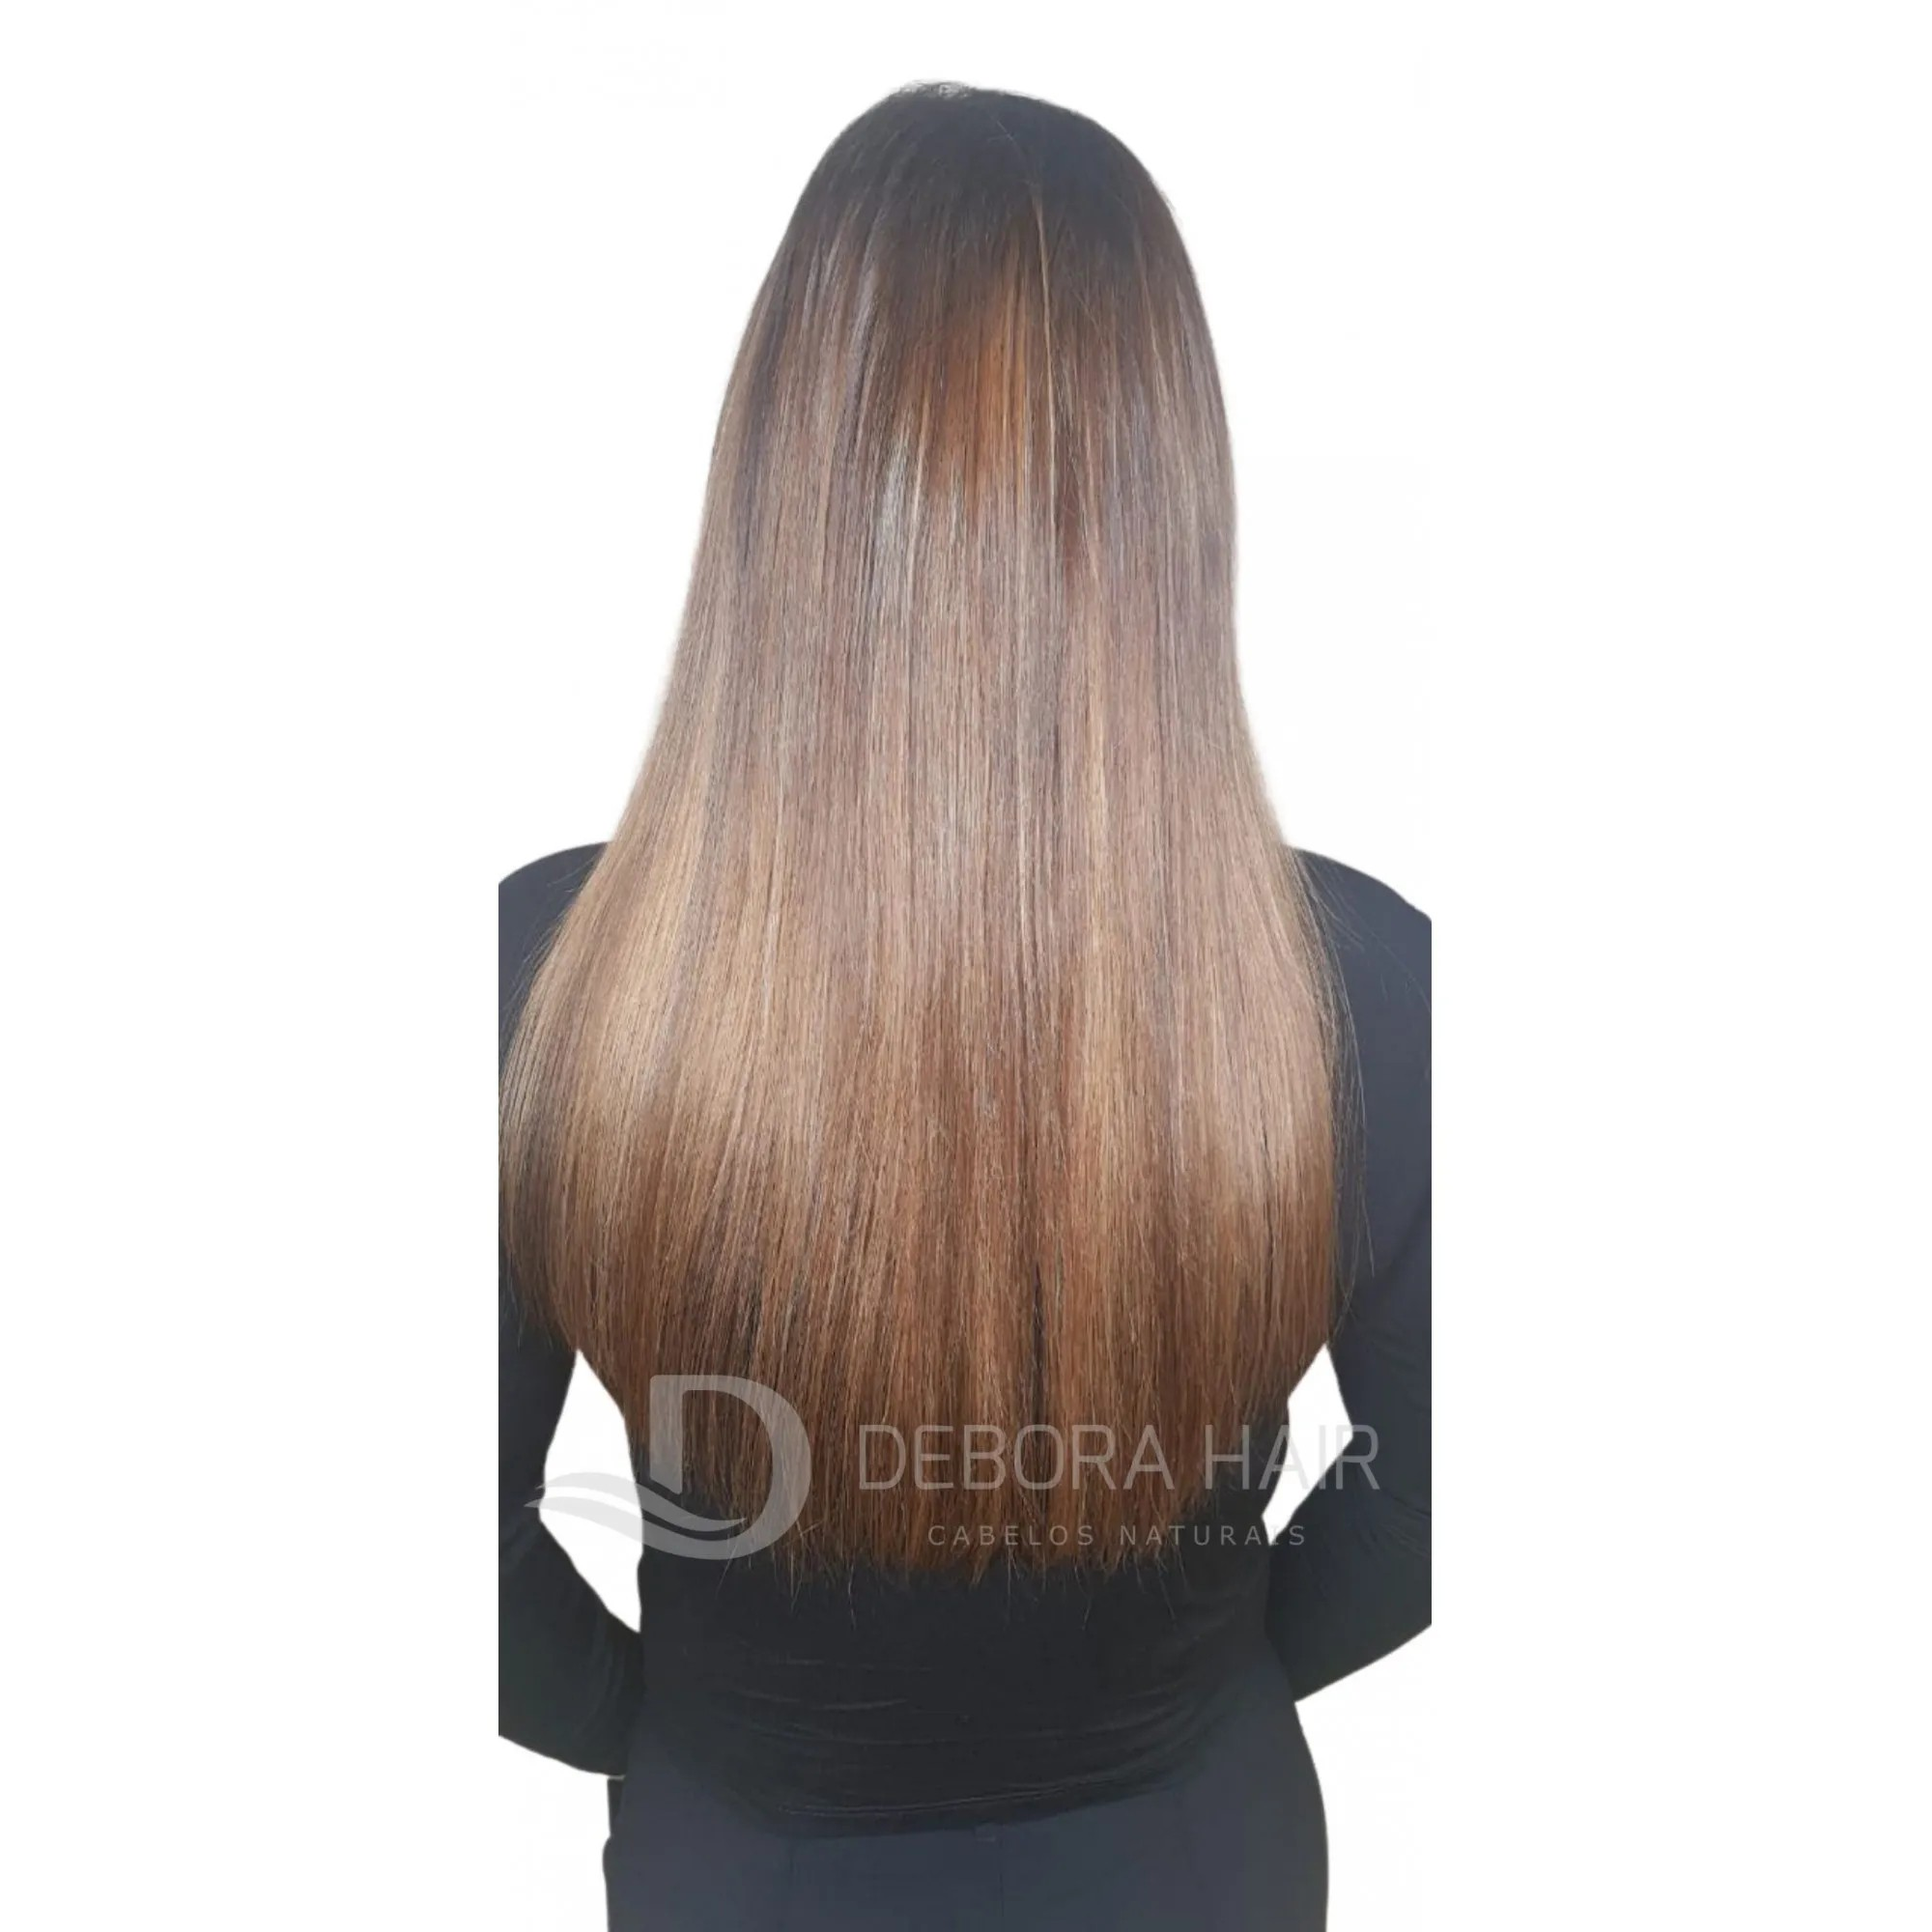 Mega Hair Fita Adesiva 65 cm (SN) N. 1304 20 Peças  - DEBORA HAIR